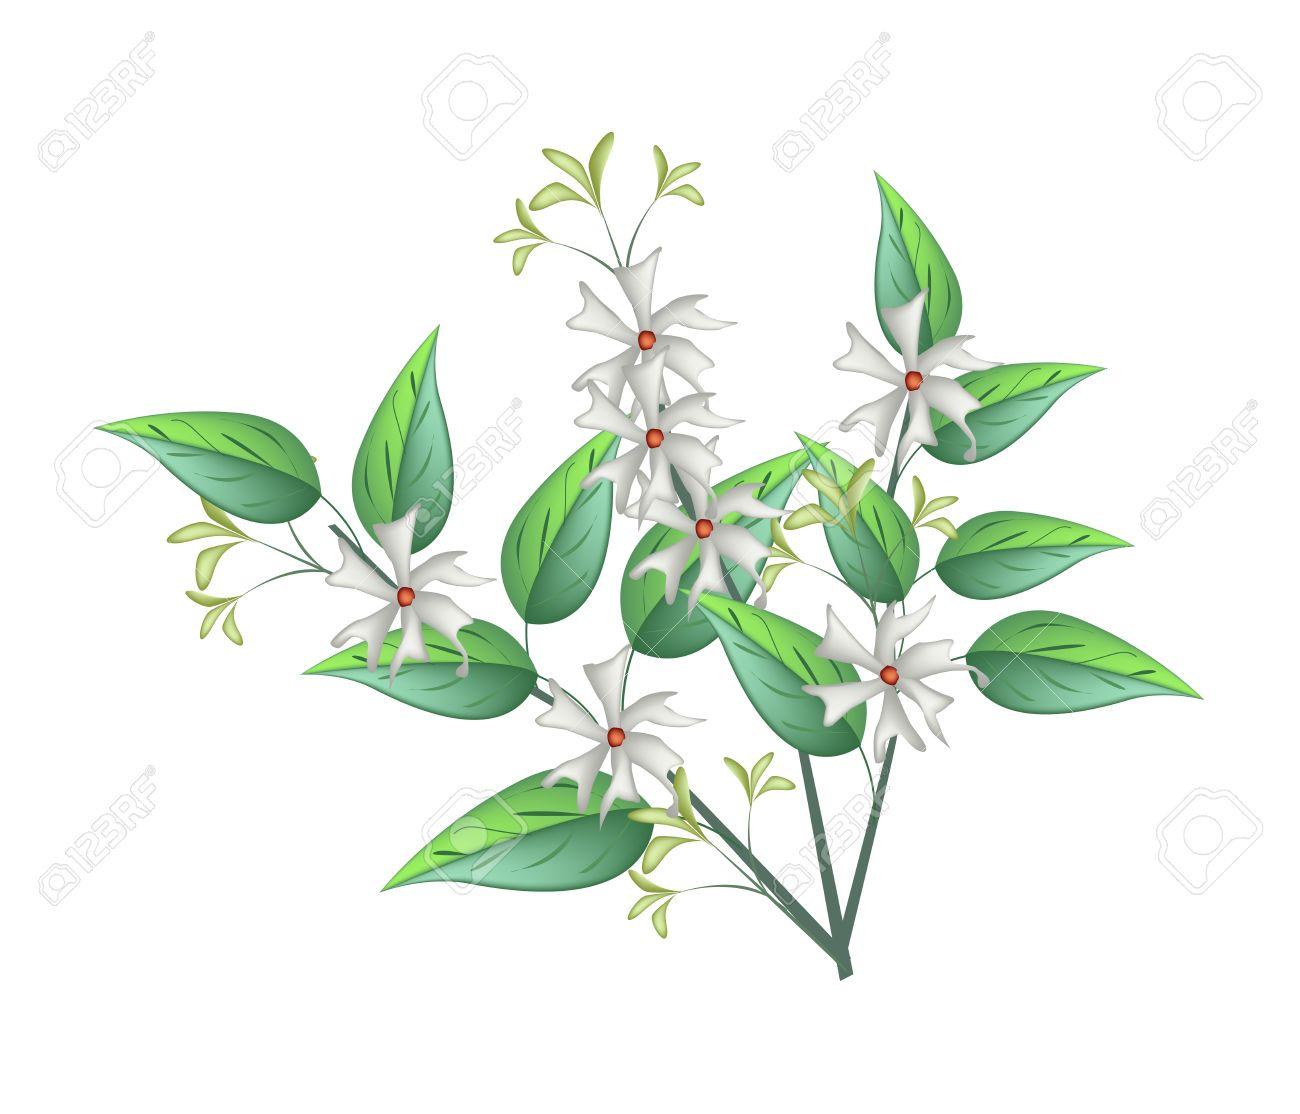 Beautiful Flower Bunch Of White Tuberose Flowers Or Night Blooming